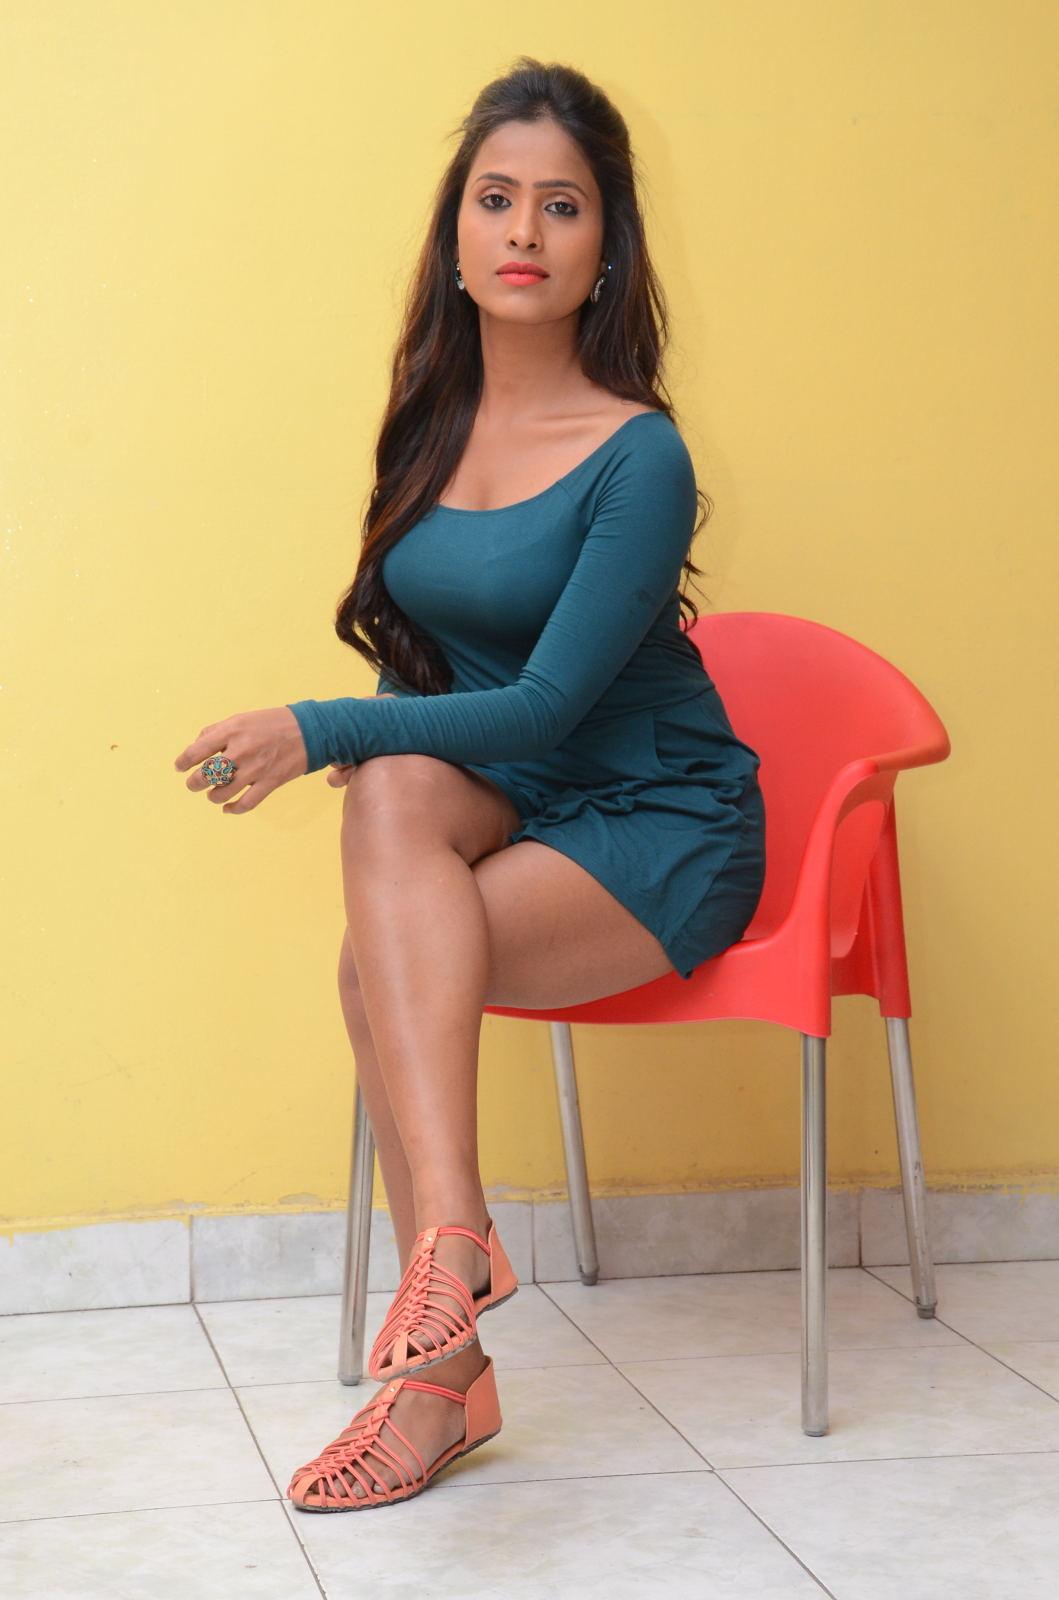 Super Hot Prashanthi In Sexy Outfit  Indian Cinema  Models  Actress-8029